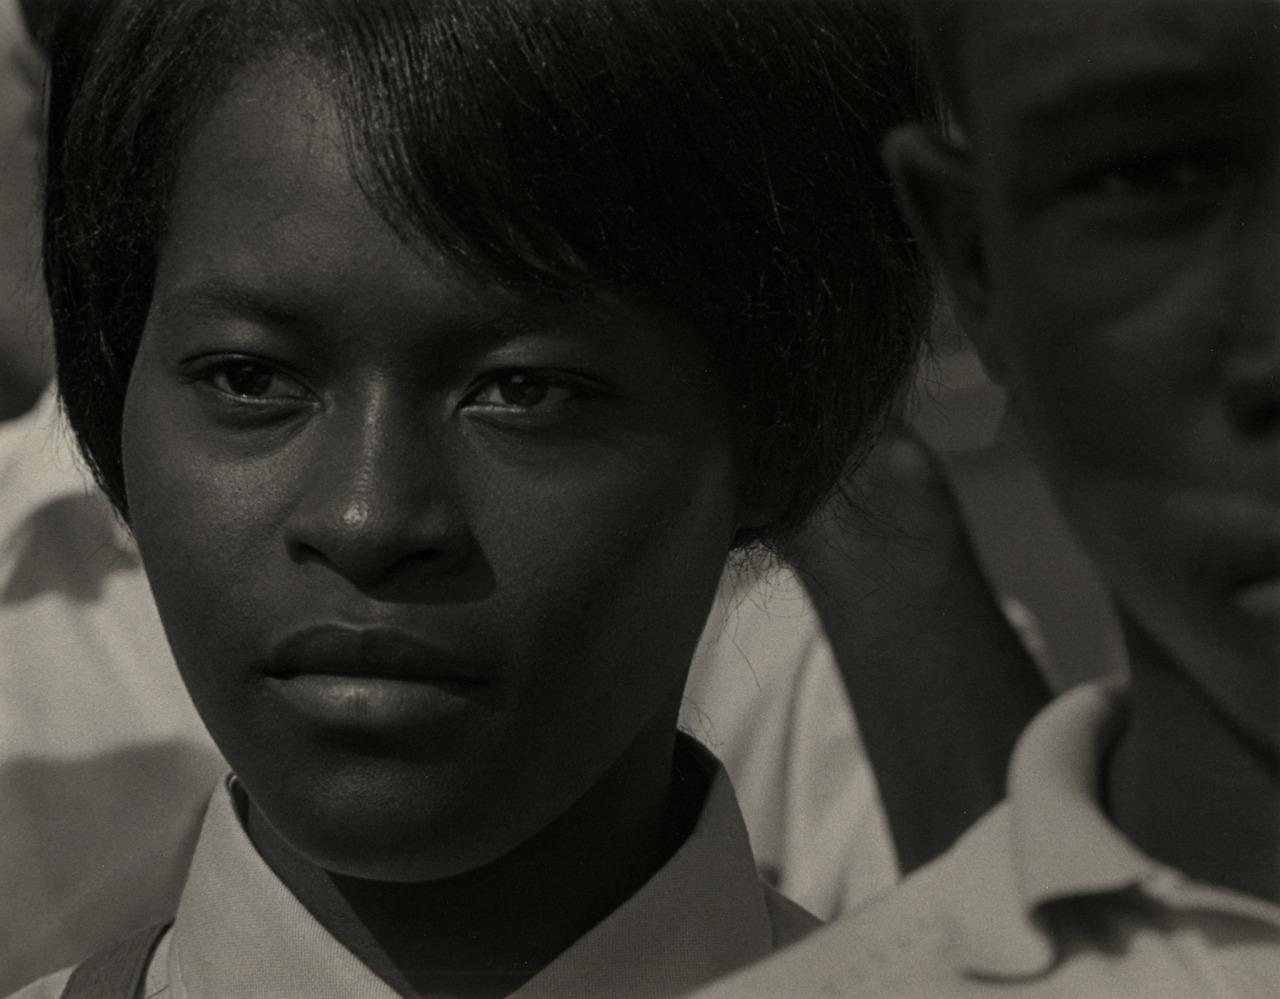 Manifestante pela liberdade em Mississippi, Washington D.C., 1963.Foto de Roy DeCarava